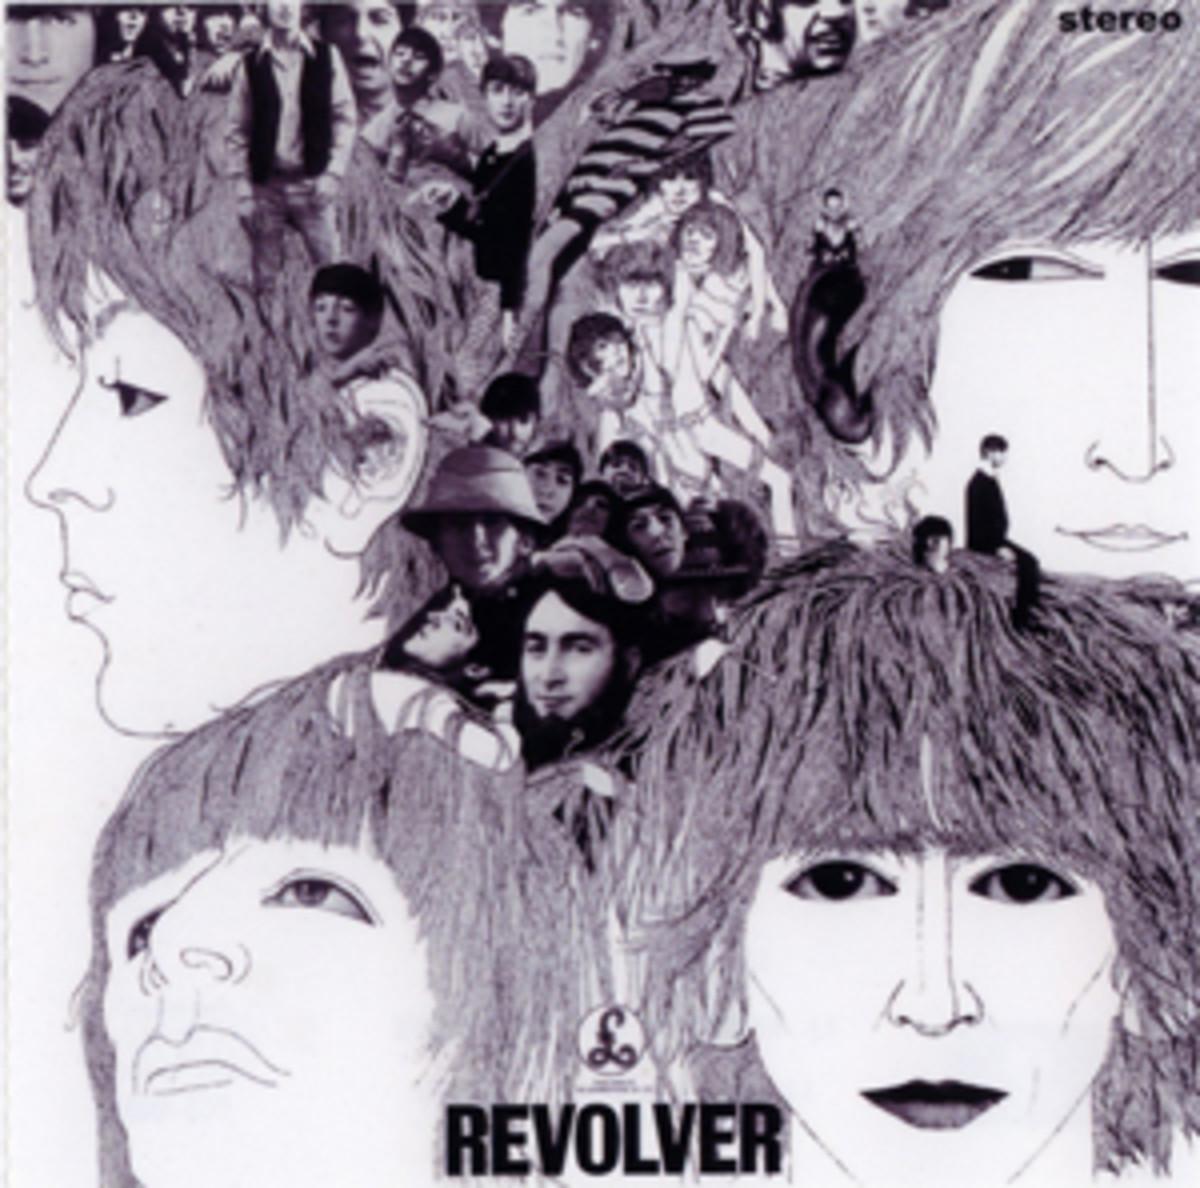 TheBeatles_Revolver